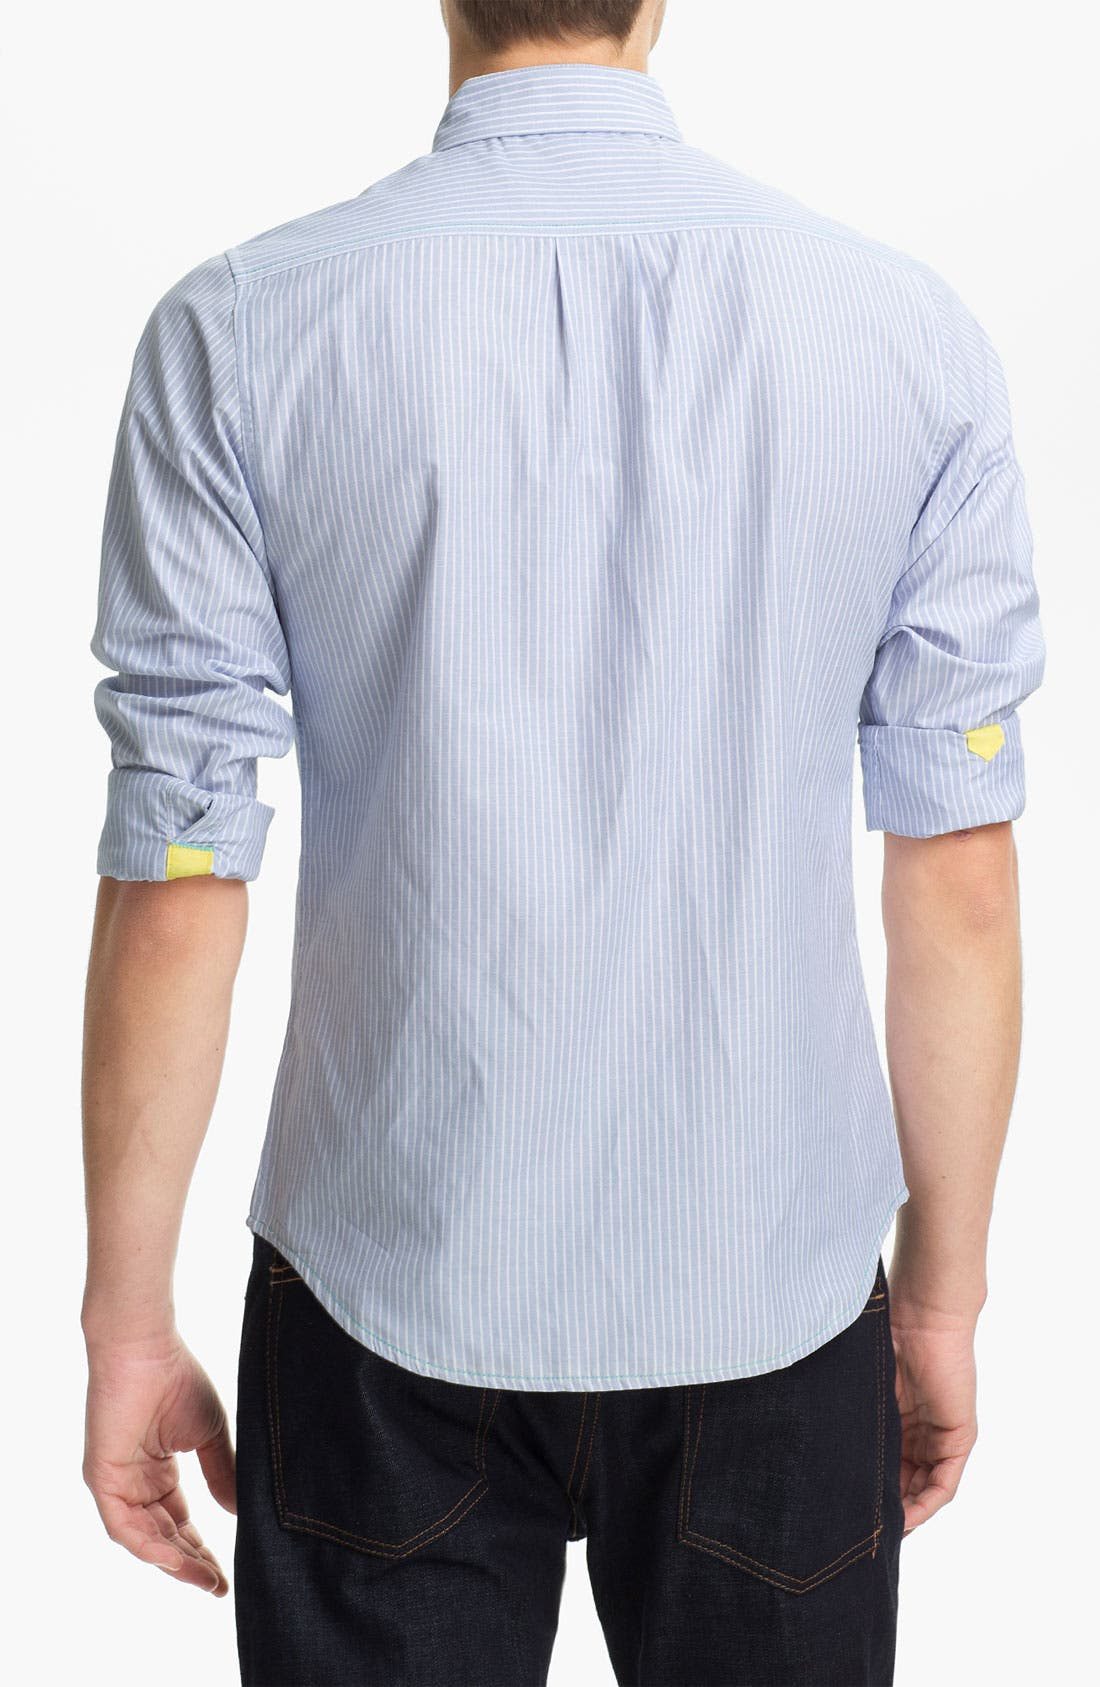 Alternate Image 2  - Descendant of Thieves Stripe Woven Shirt